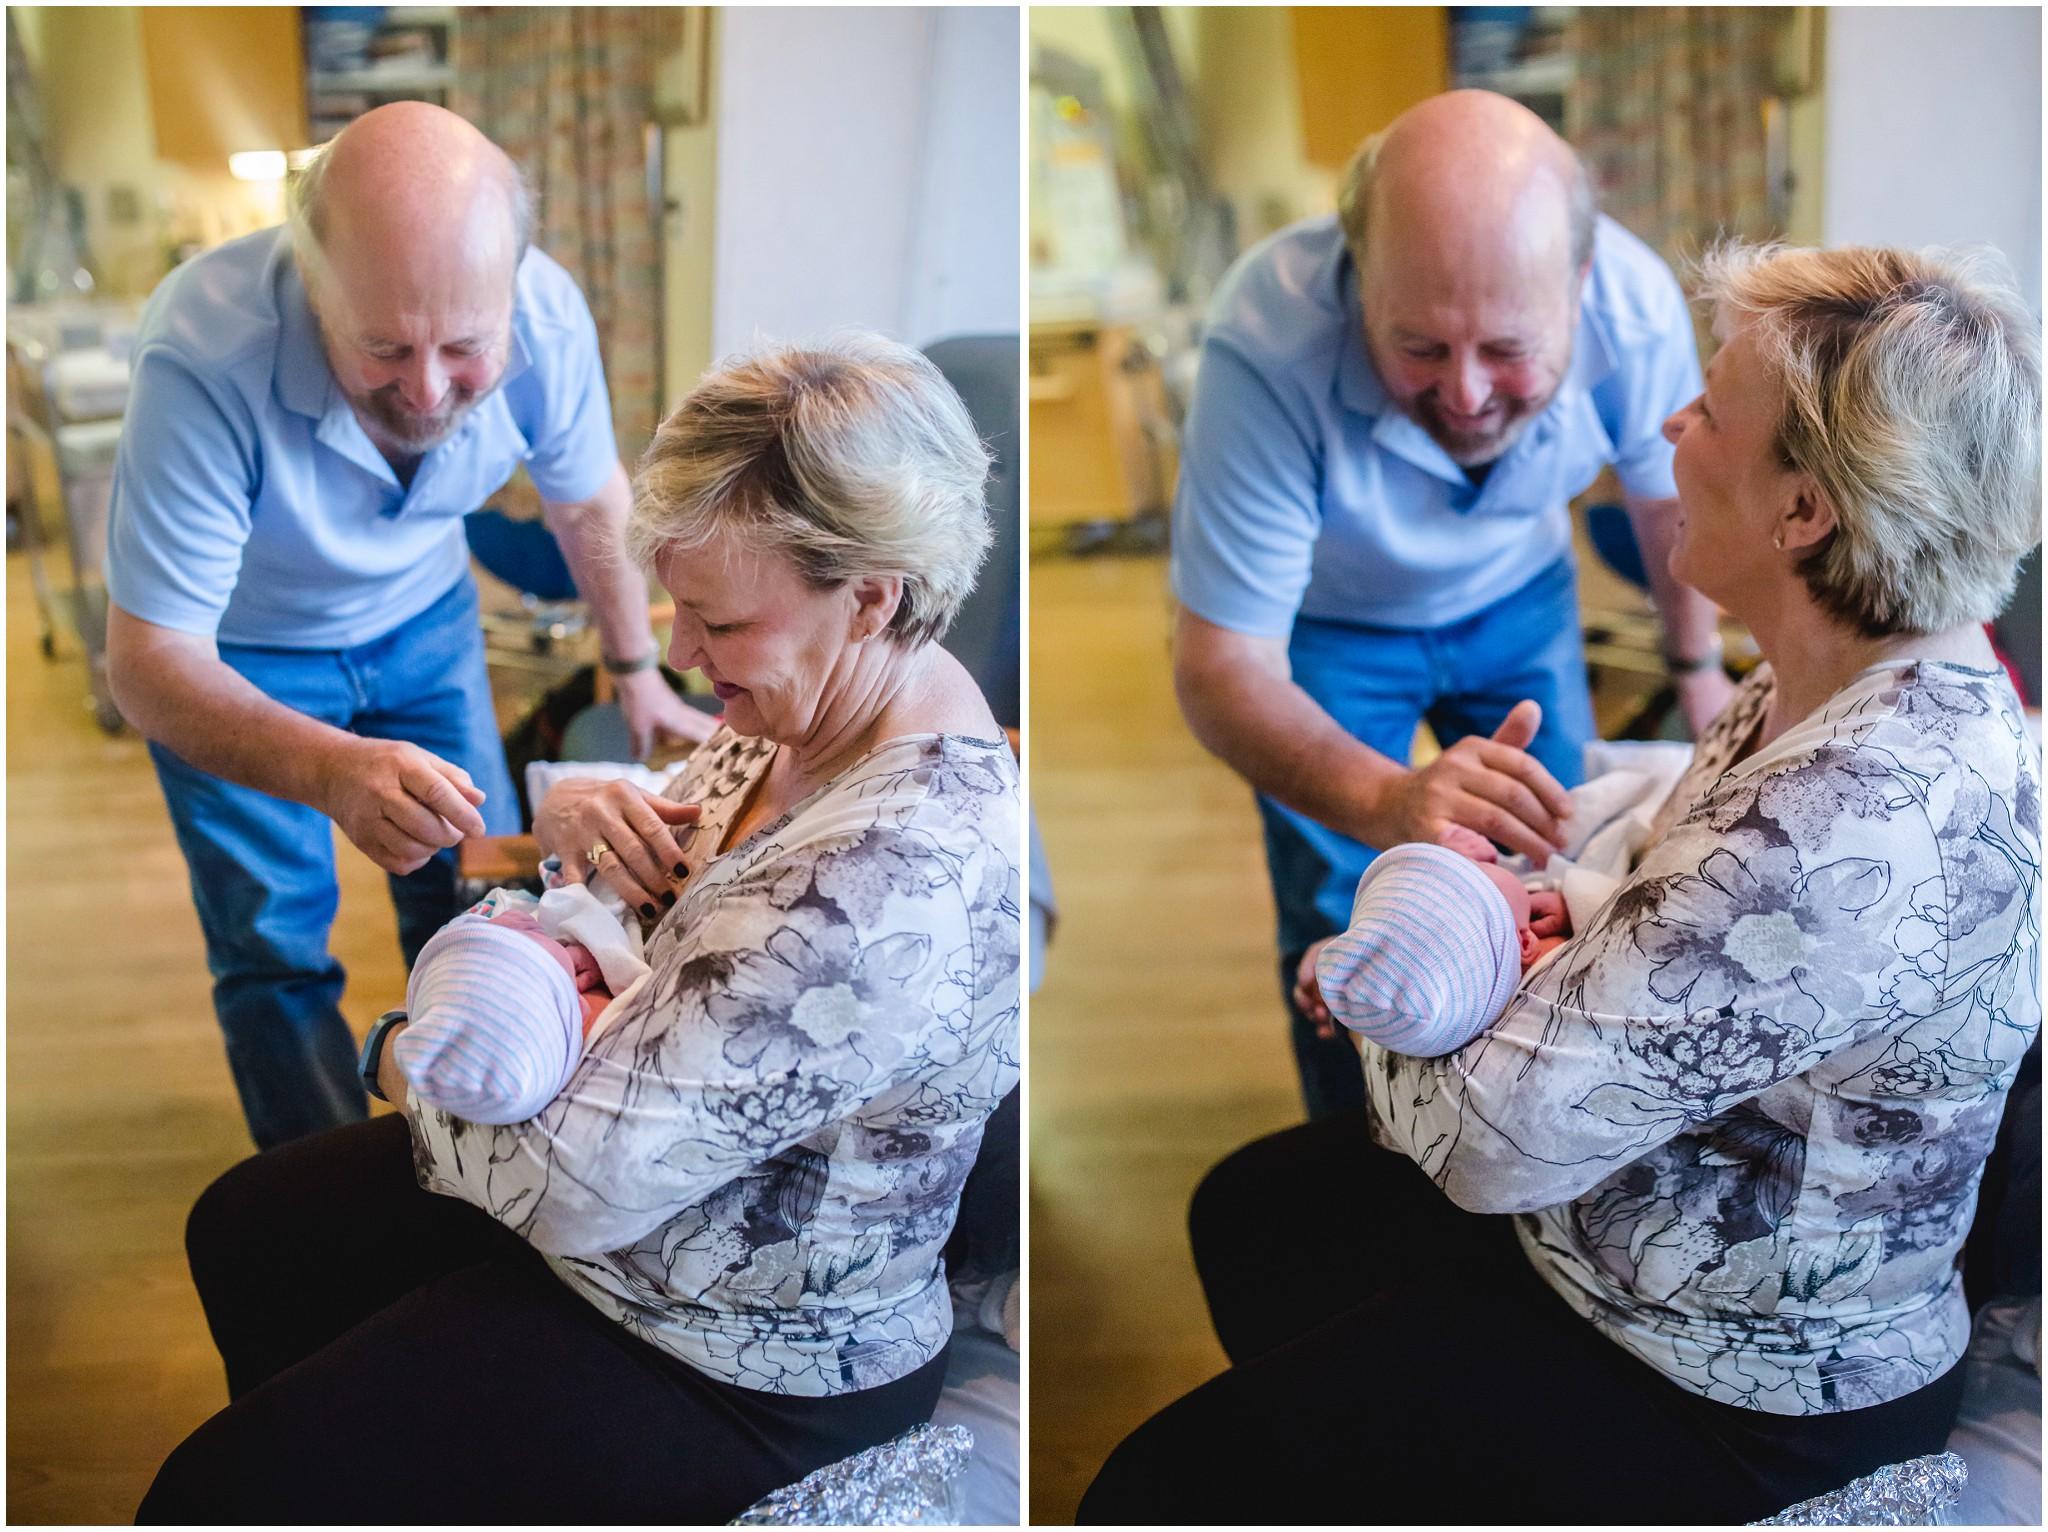 At the Denver hospital meeting their grandson